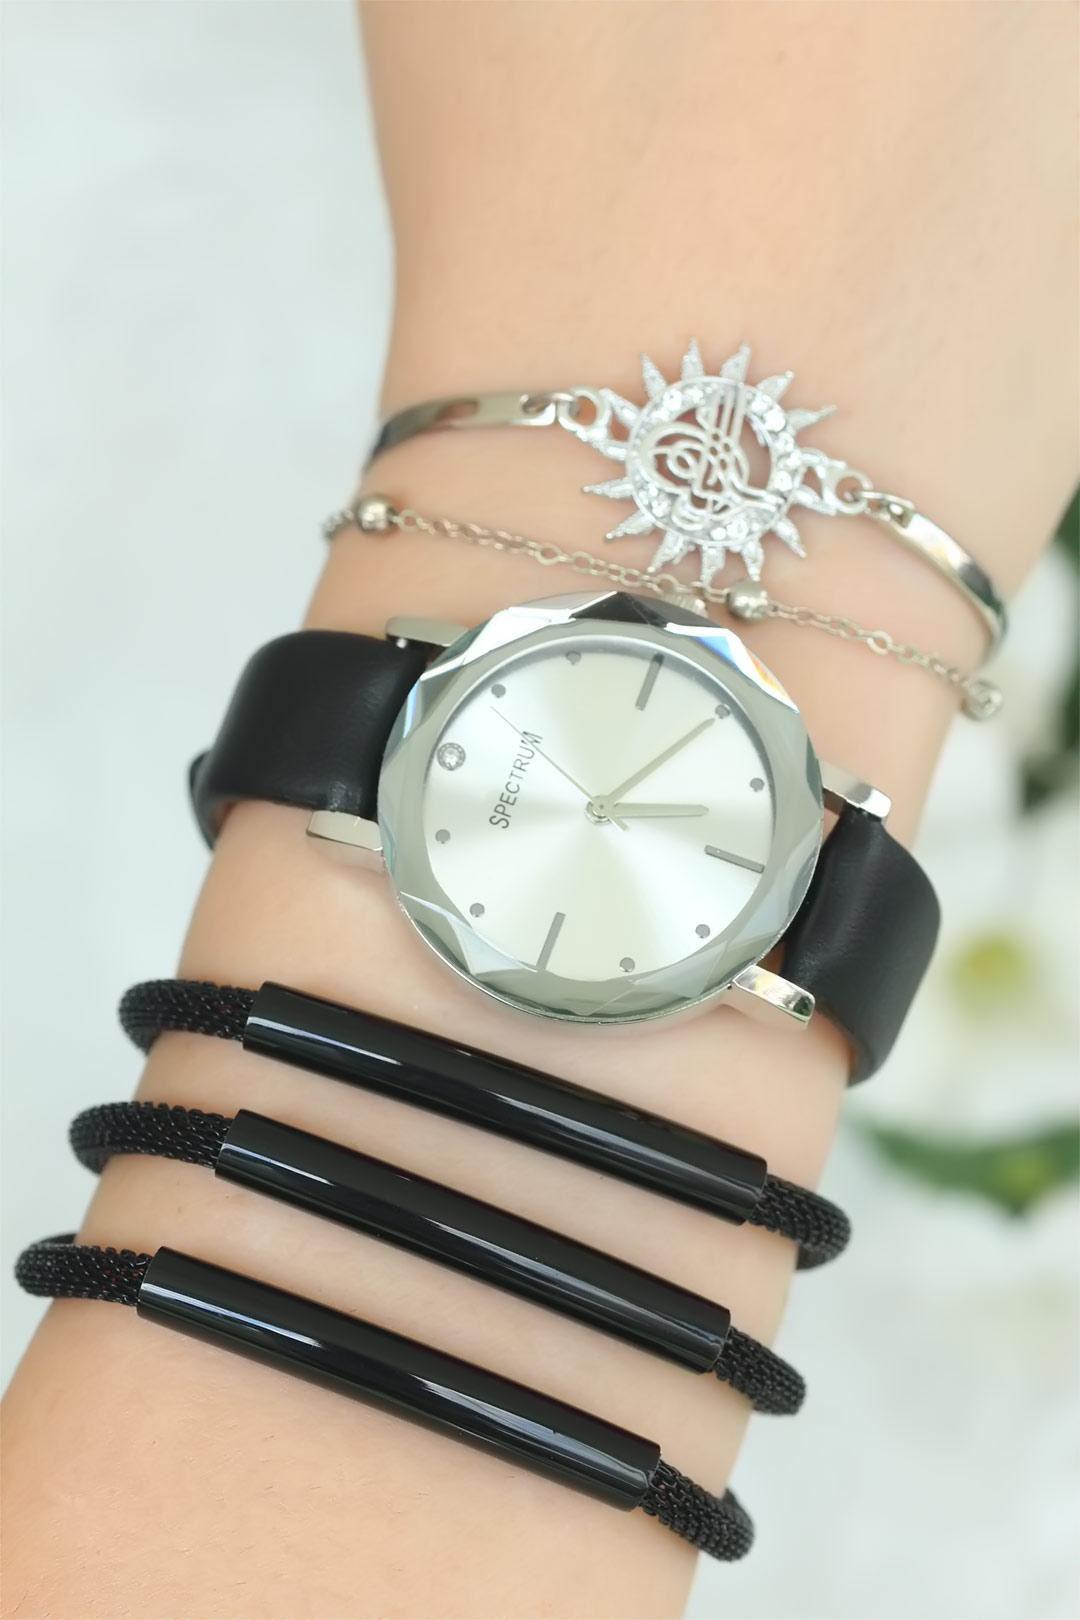 Siyah Renk Deri Kordonlu Bayan Saat Kombini